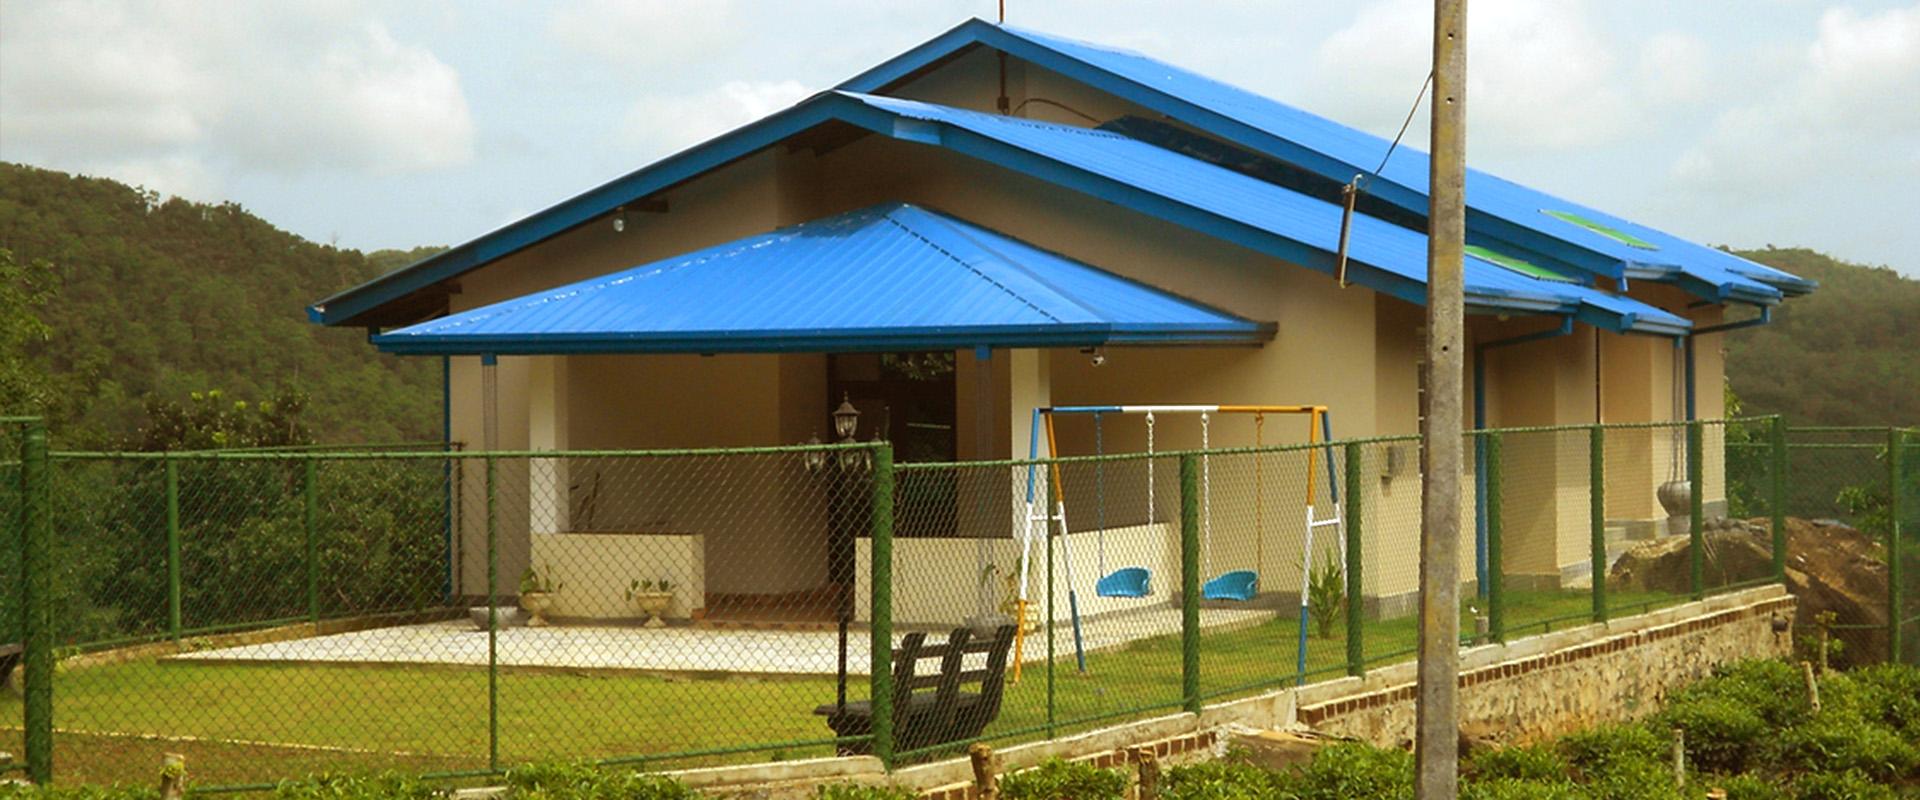 Bluestar Roofing Steel Roofing Solutions In Sri Lanka